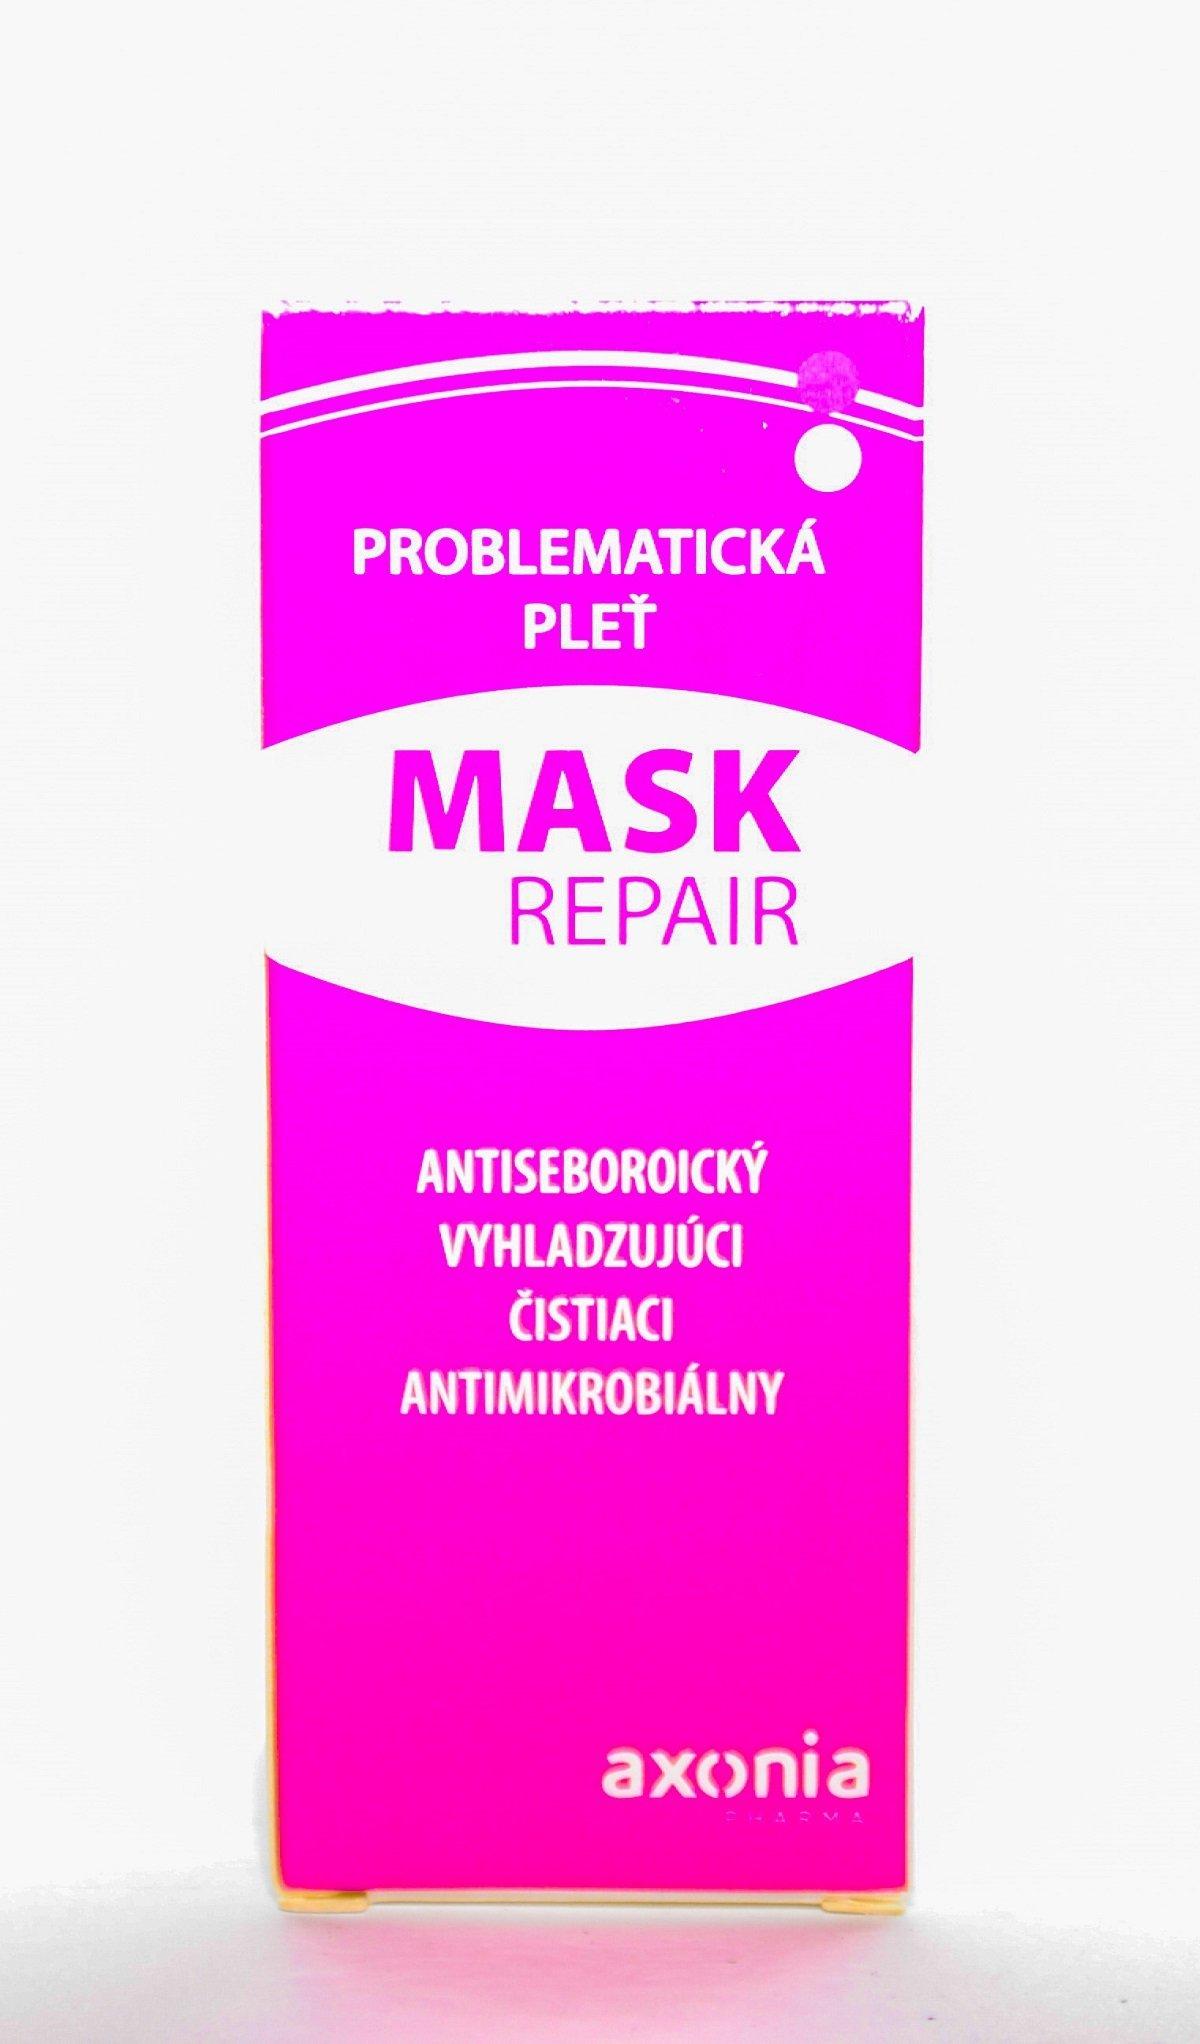 Laboratori Farmaceutici Krymi S.p.A. MASK REPAIR emulzia pre problematickú pleť 50 ml